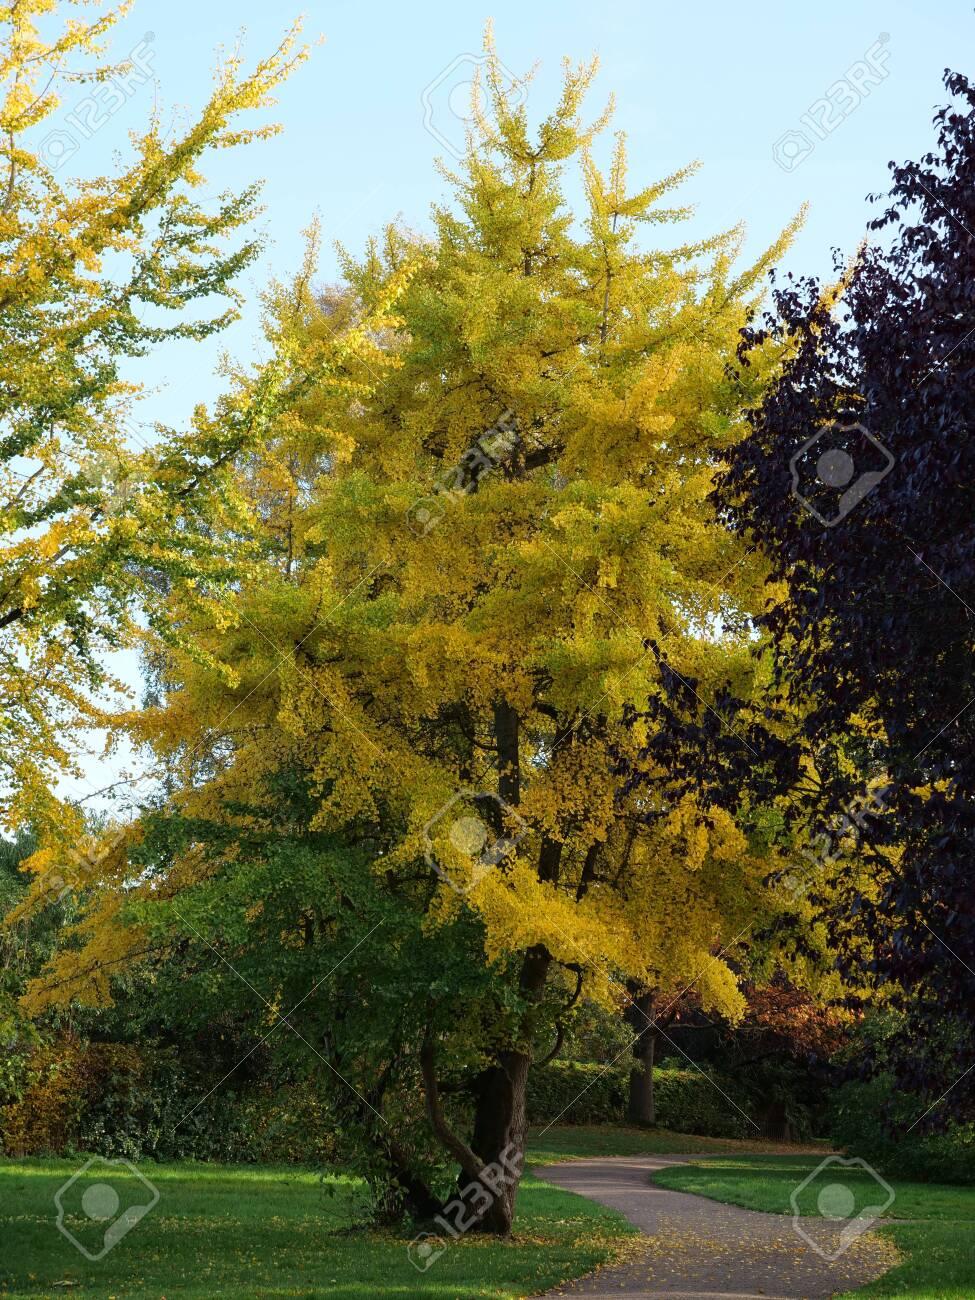 Ginkgo Tree Ginkgo Biloba In A Park In Autumn Stock Photo